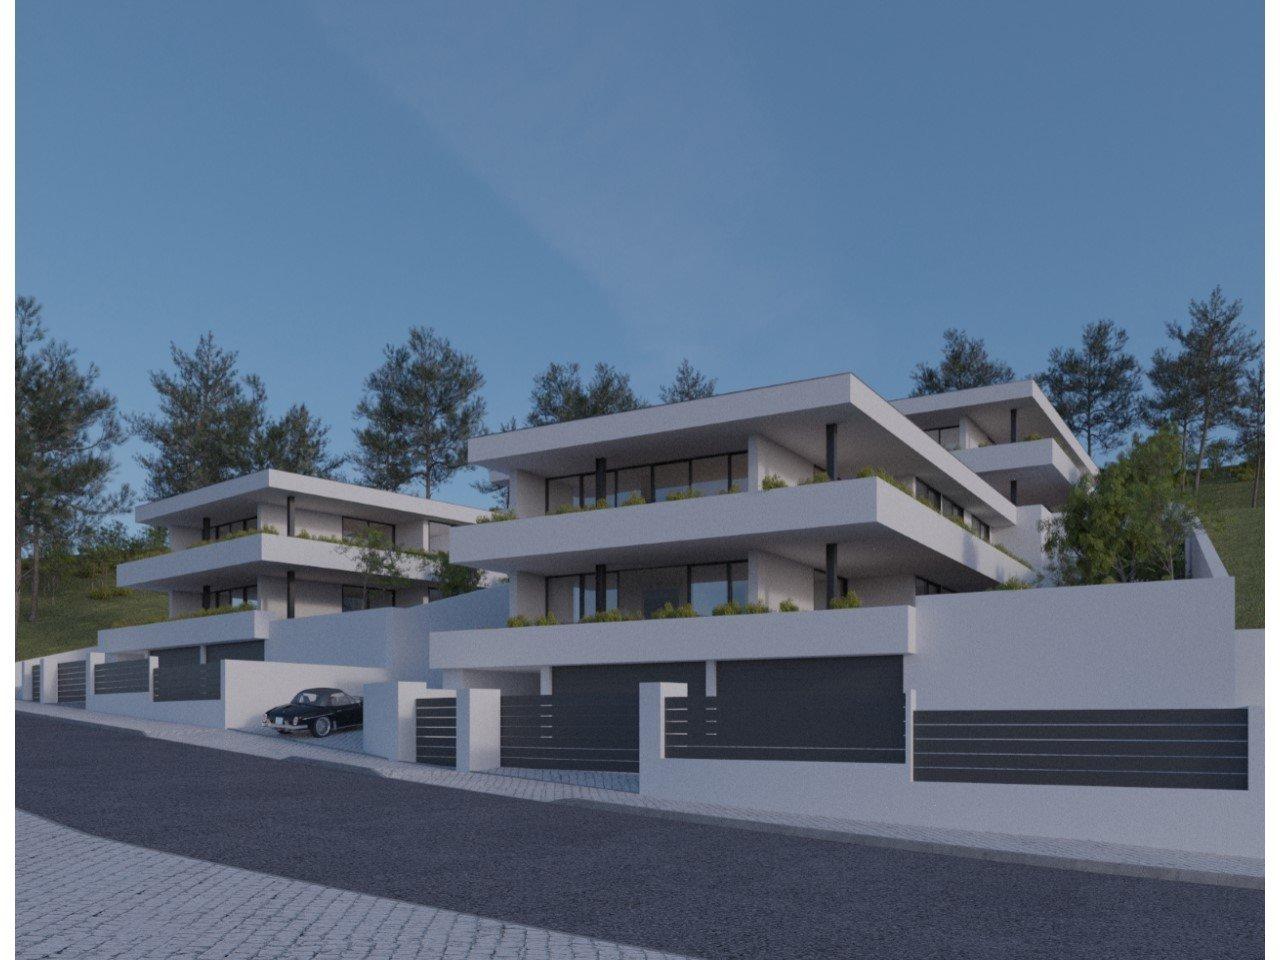 3 Bedroom Apartment Cascais, Lisbon Ref: AMA13996